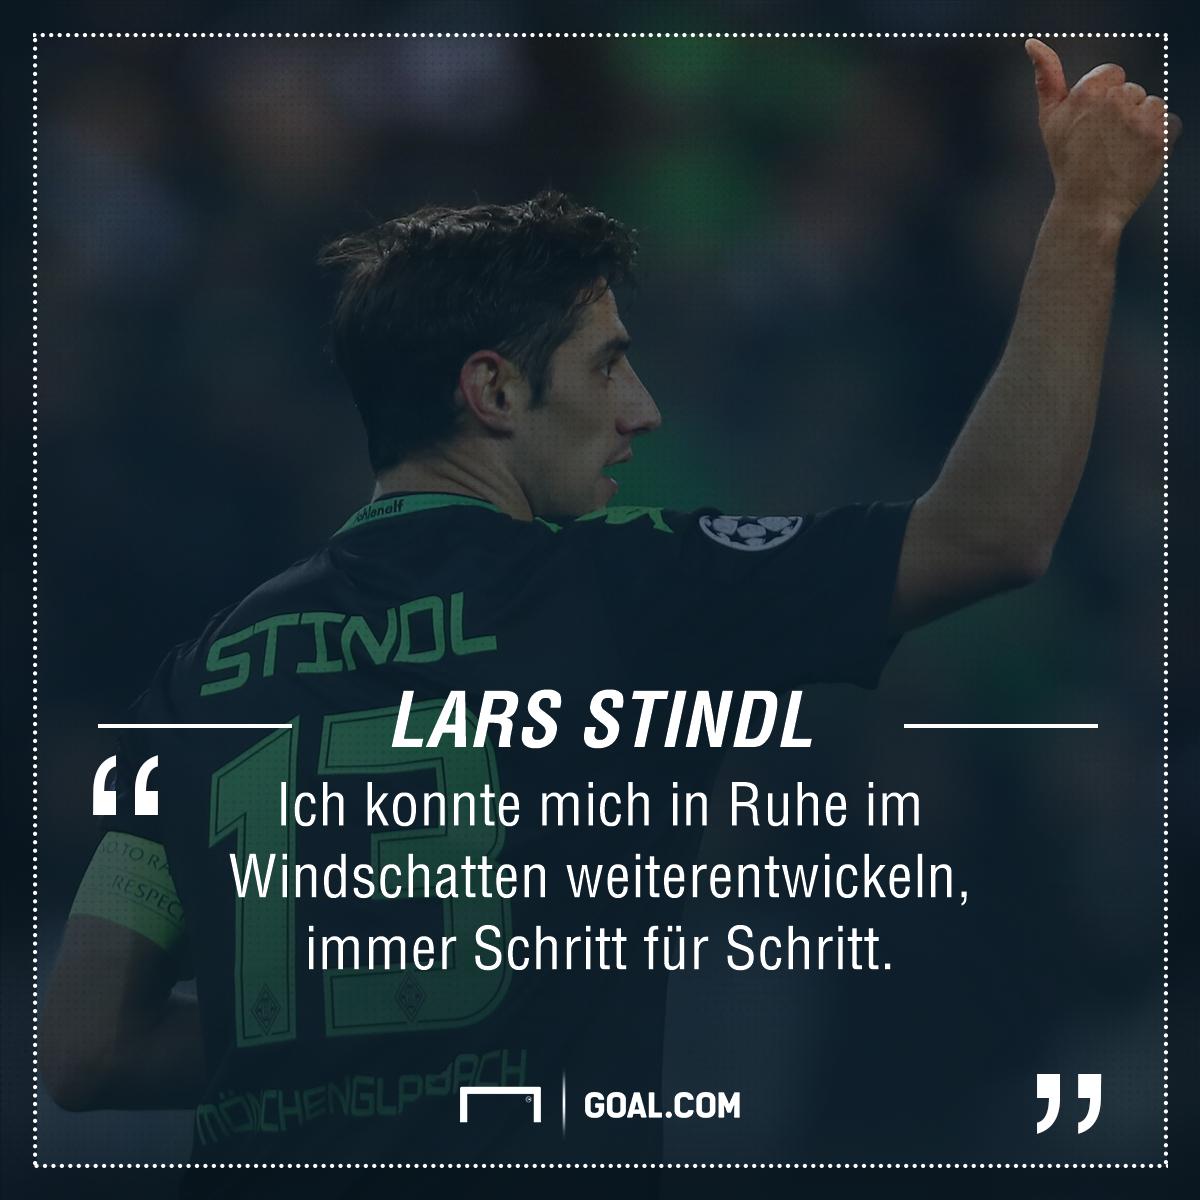 Lars Stindl GFX